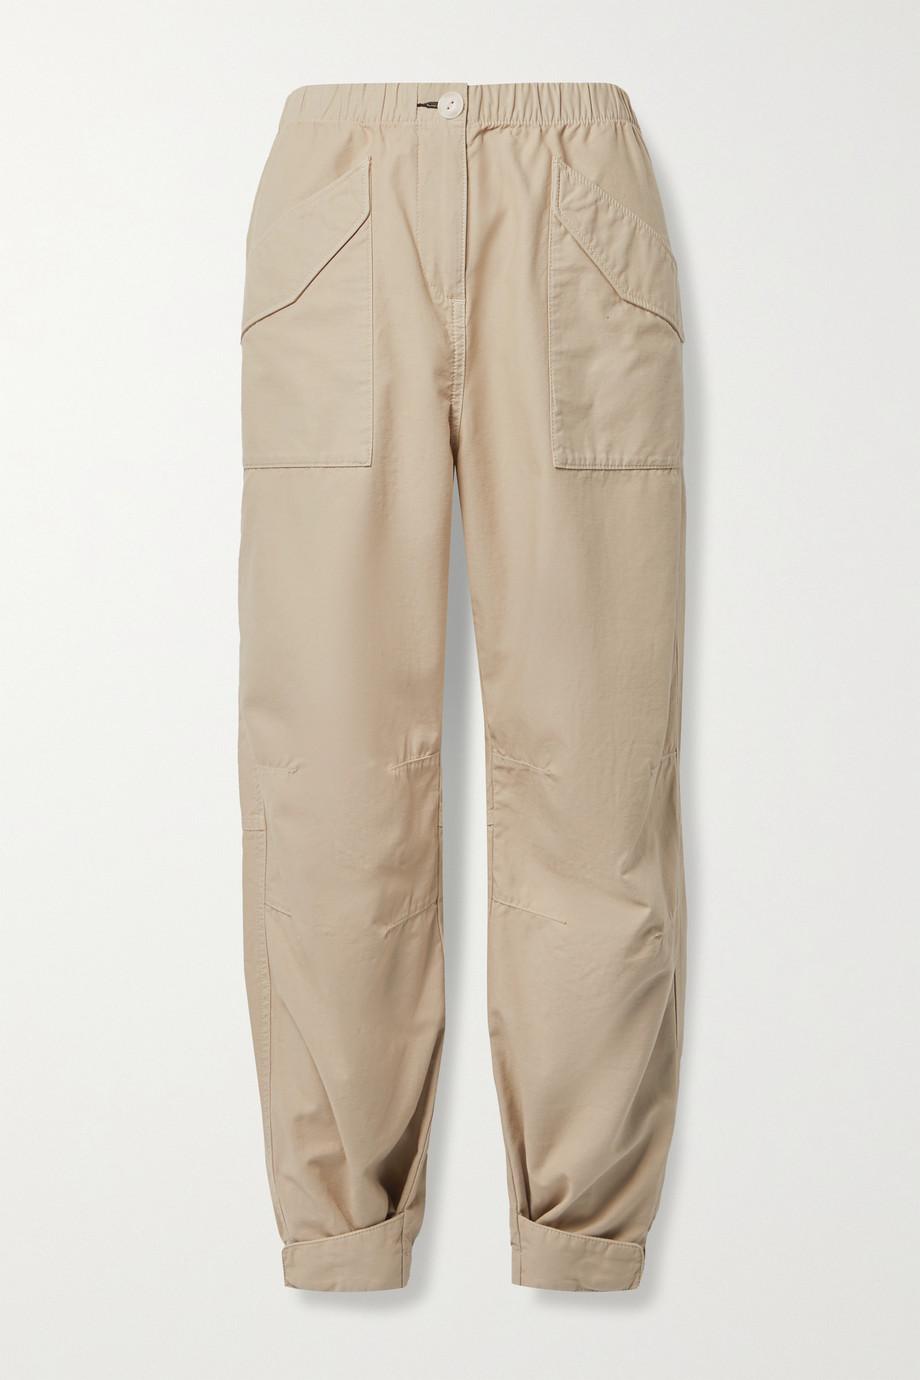 rag & bone Angela Field cotton tapered pants